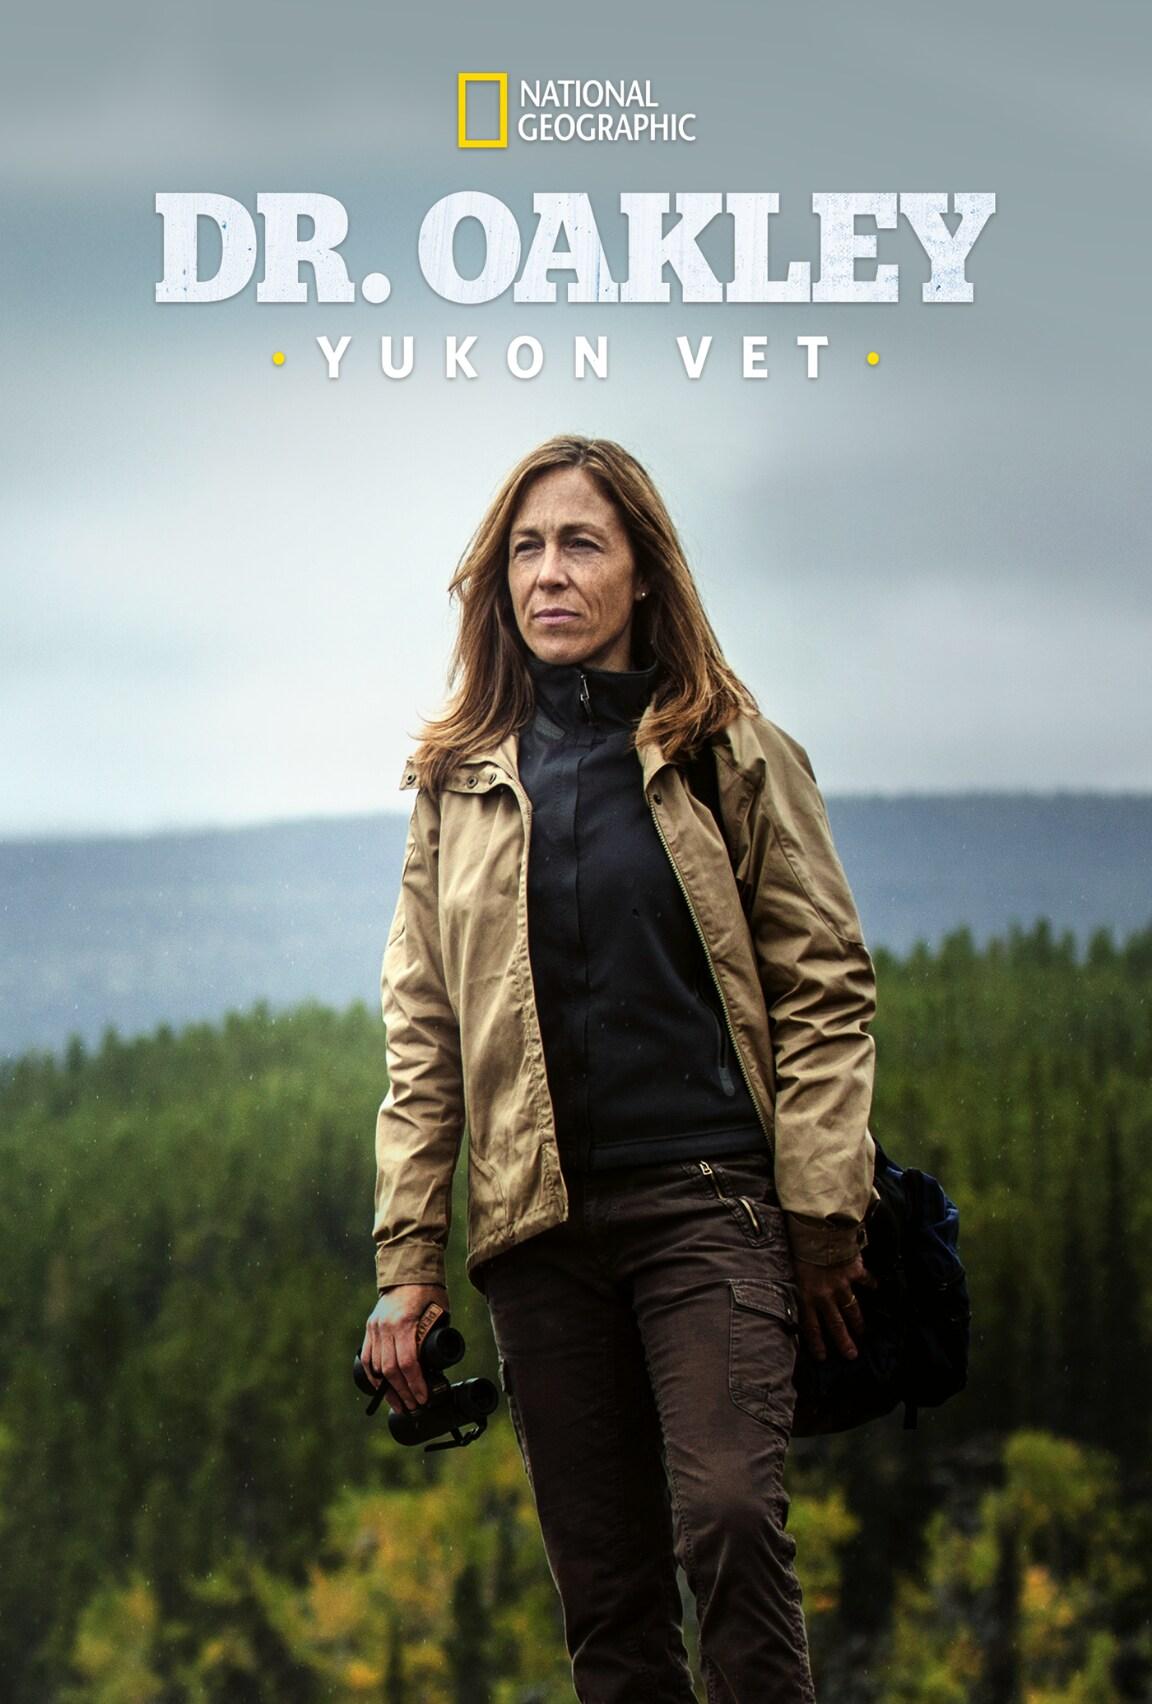 Dr. Oakley, Yukon Vet (2014)